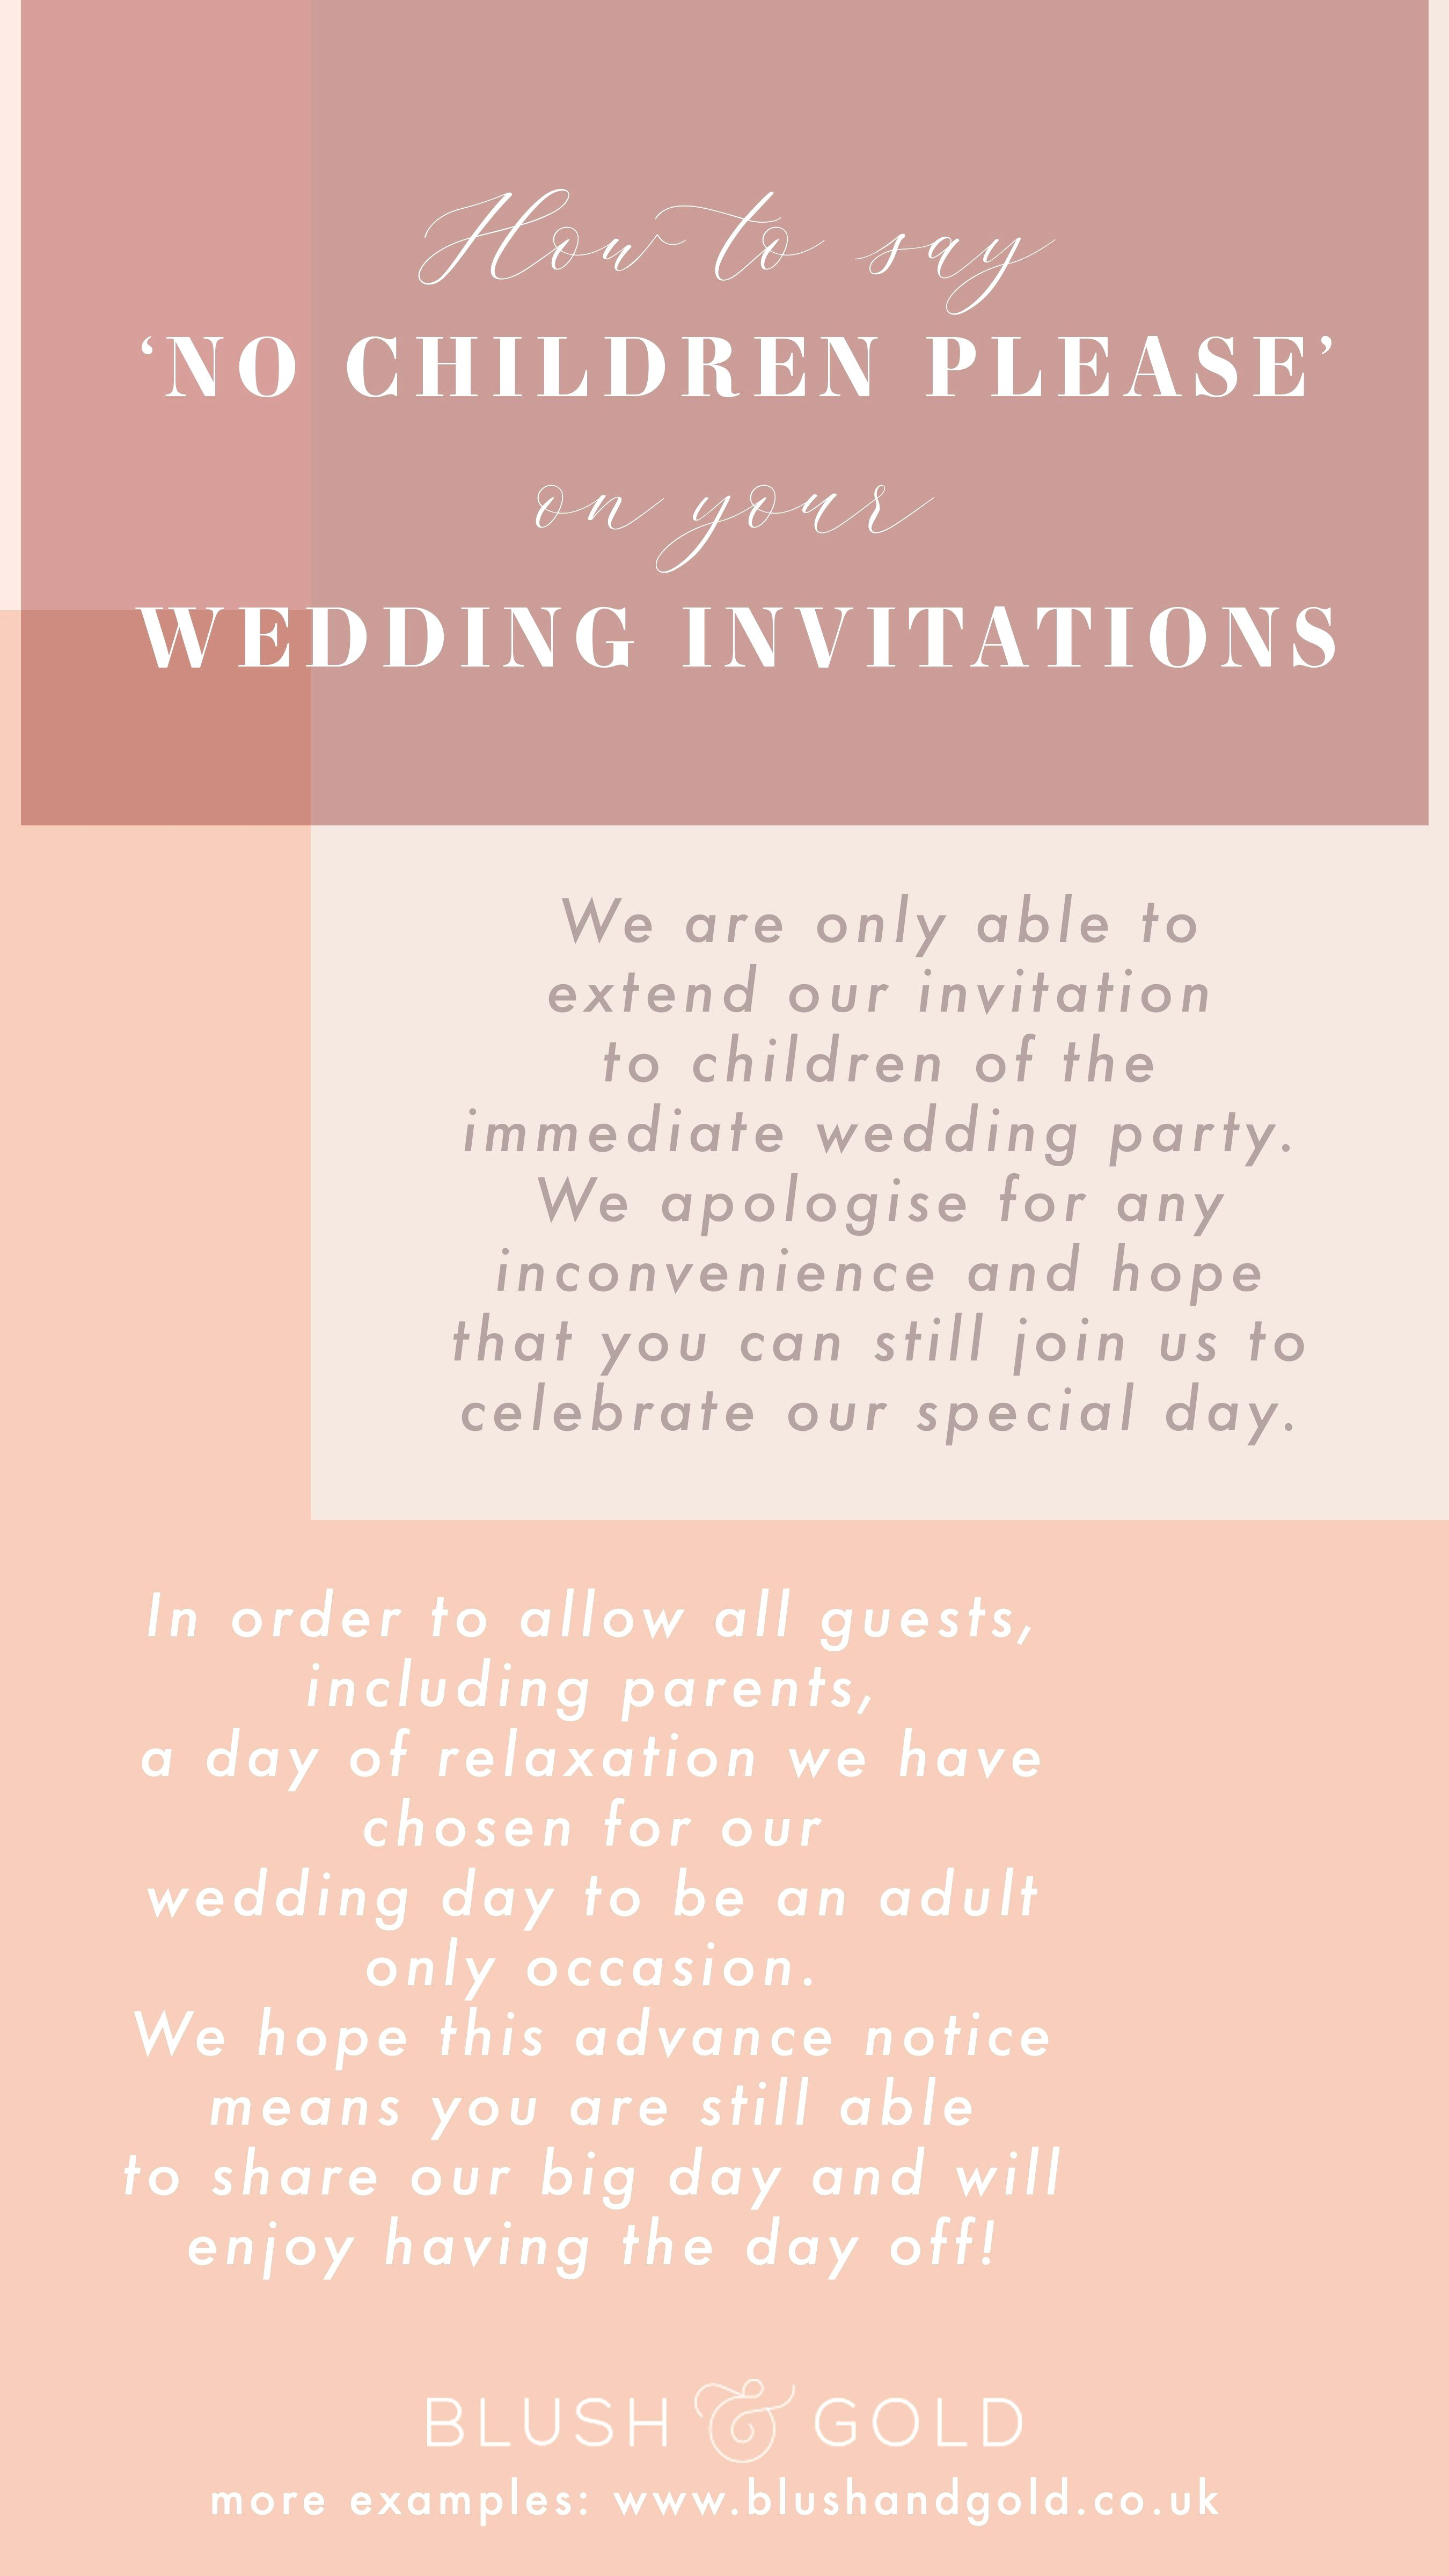 Child Free Wedding Poem Wedding With Kids Beach Wedding Invitations Country Wedding Invitations